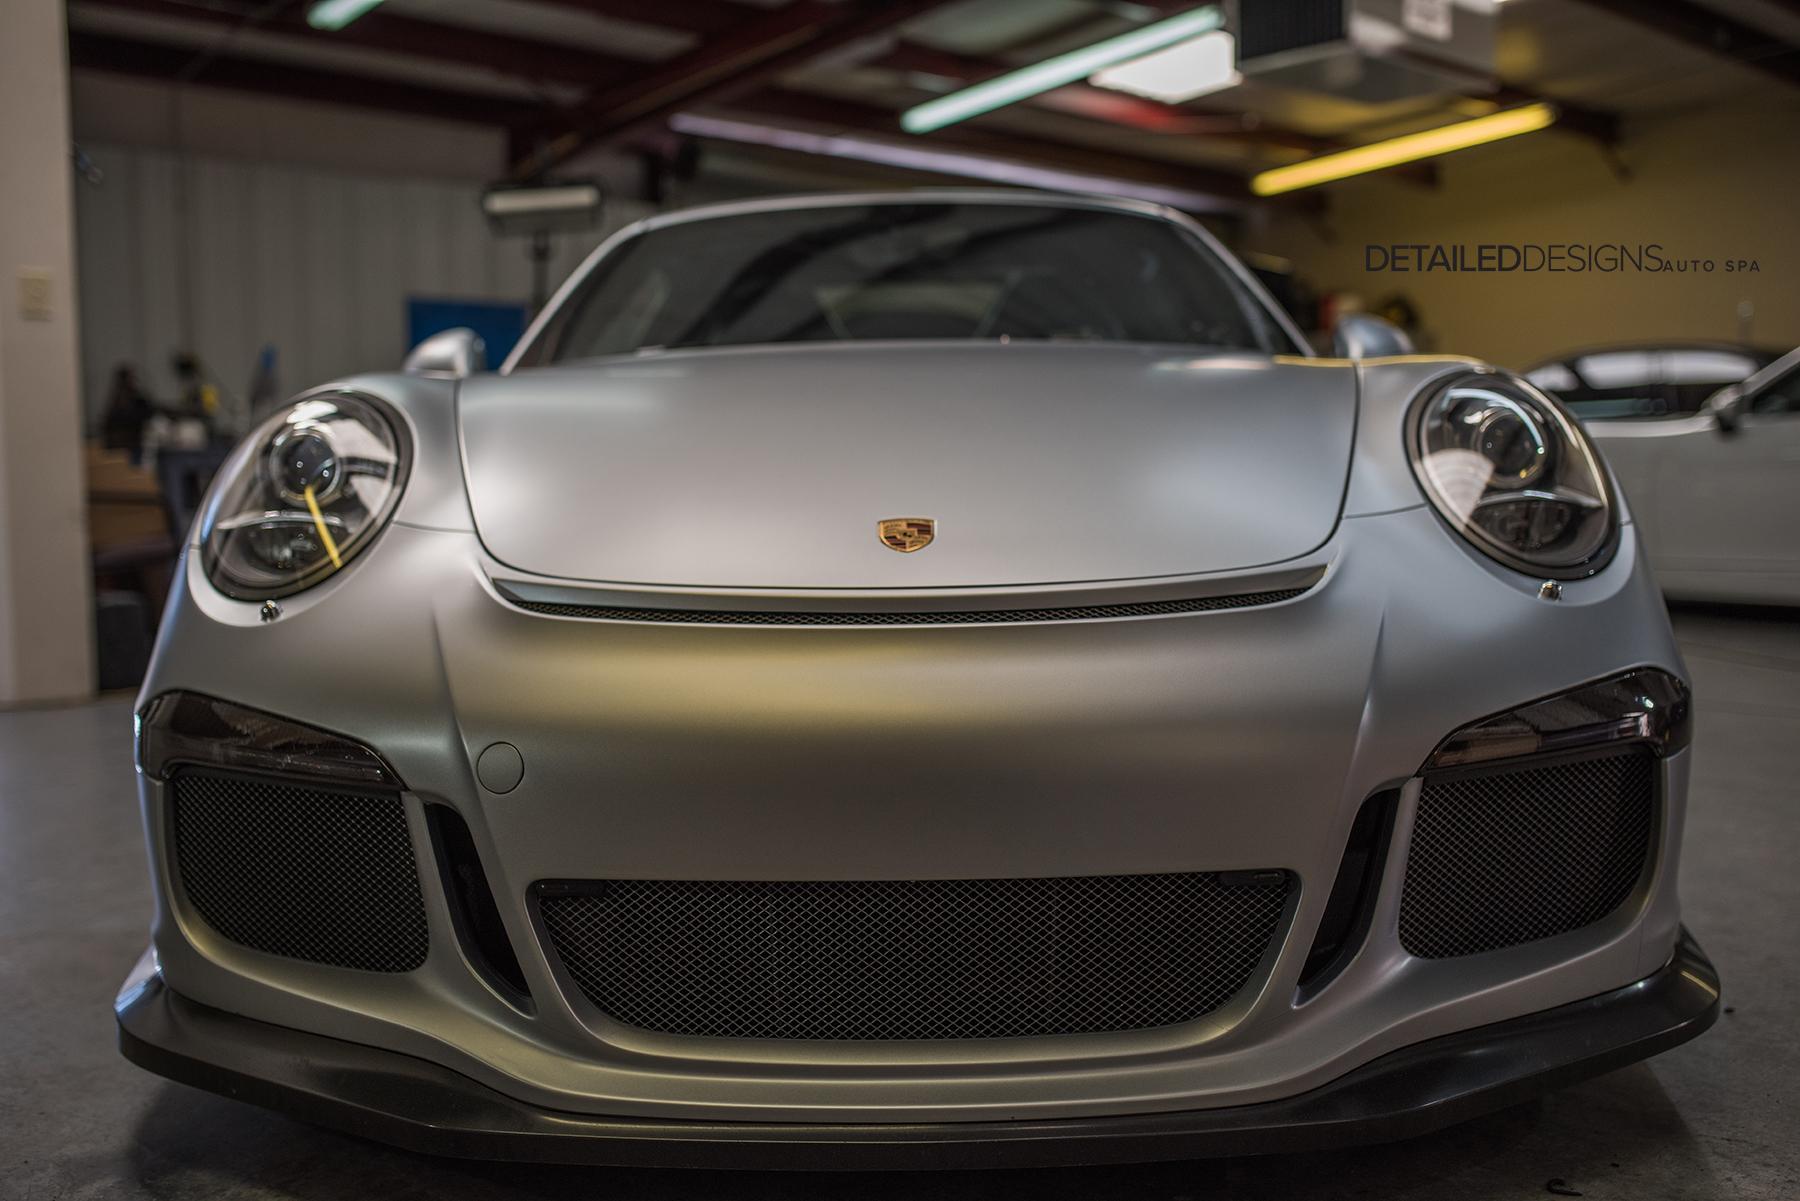 Auto Care Center >> Rhodium Silver Porsche GT3 Xpel Stealth Wrap Atlanta - Detailed Designs Auto Spa